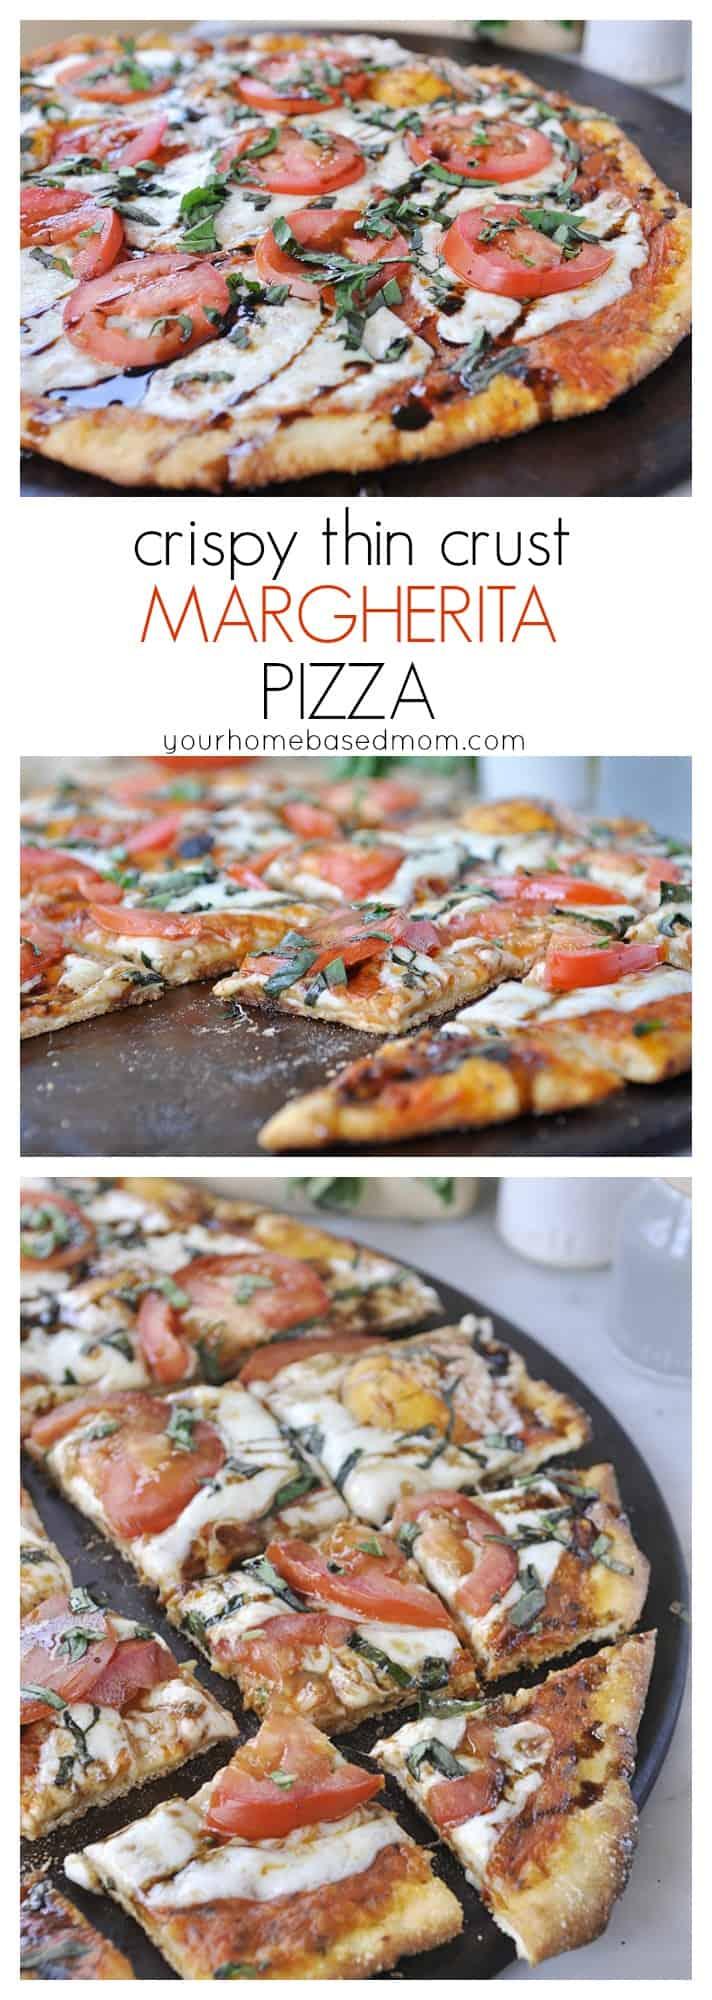 crispy thin crust margherita pizza @yourhomebasedmom.com